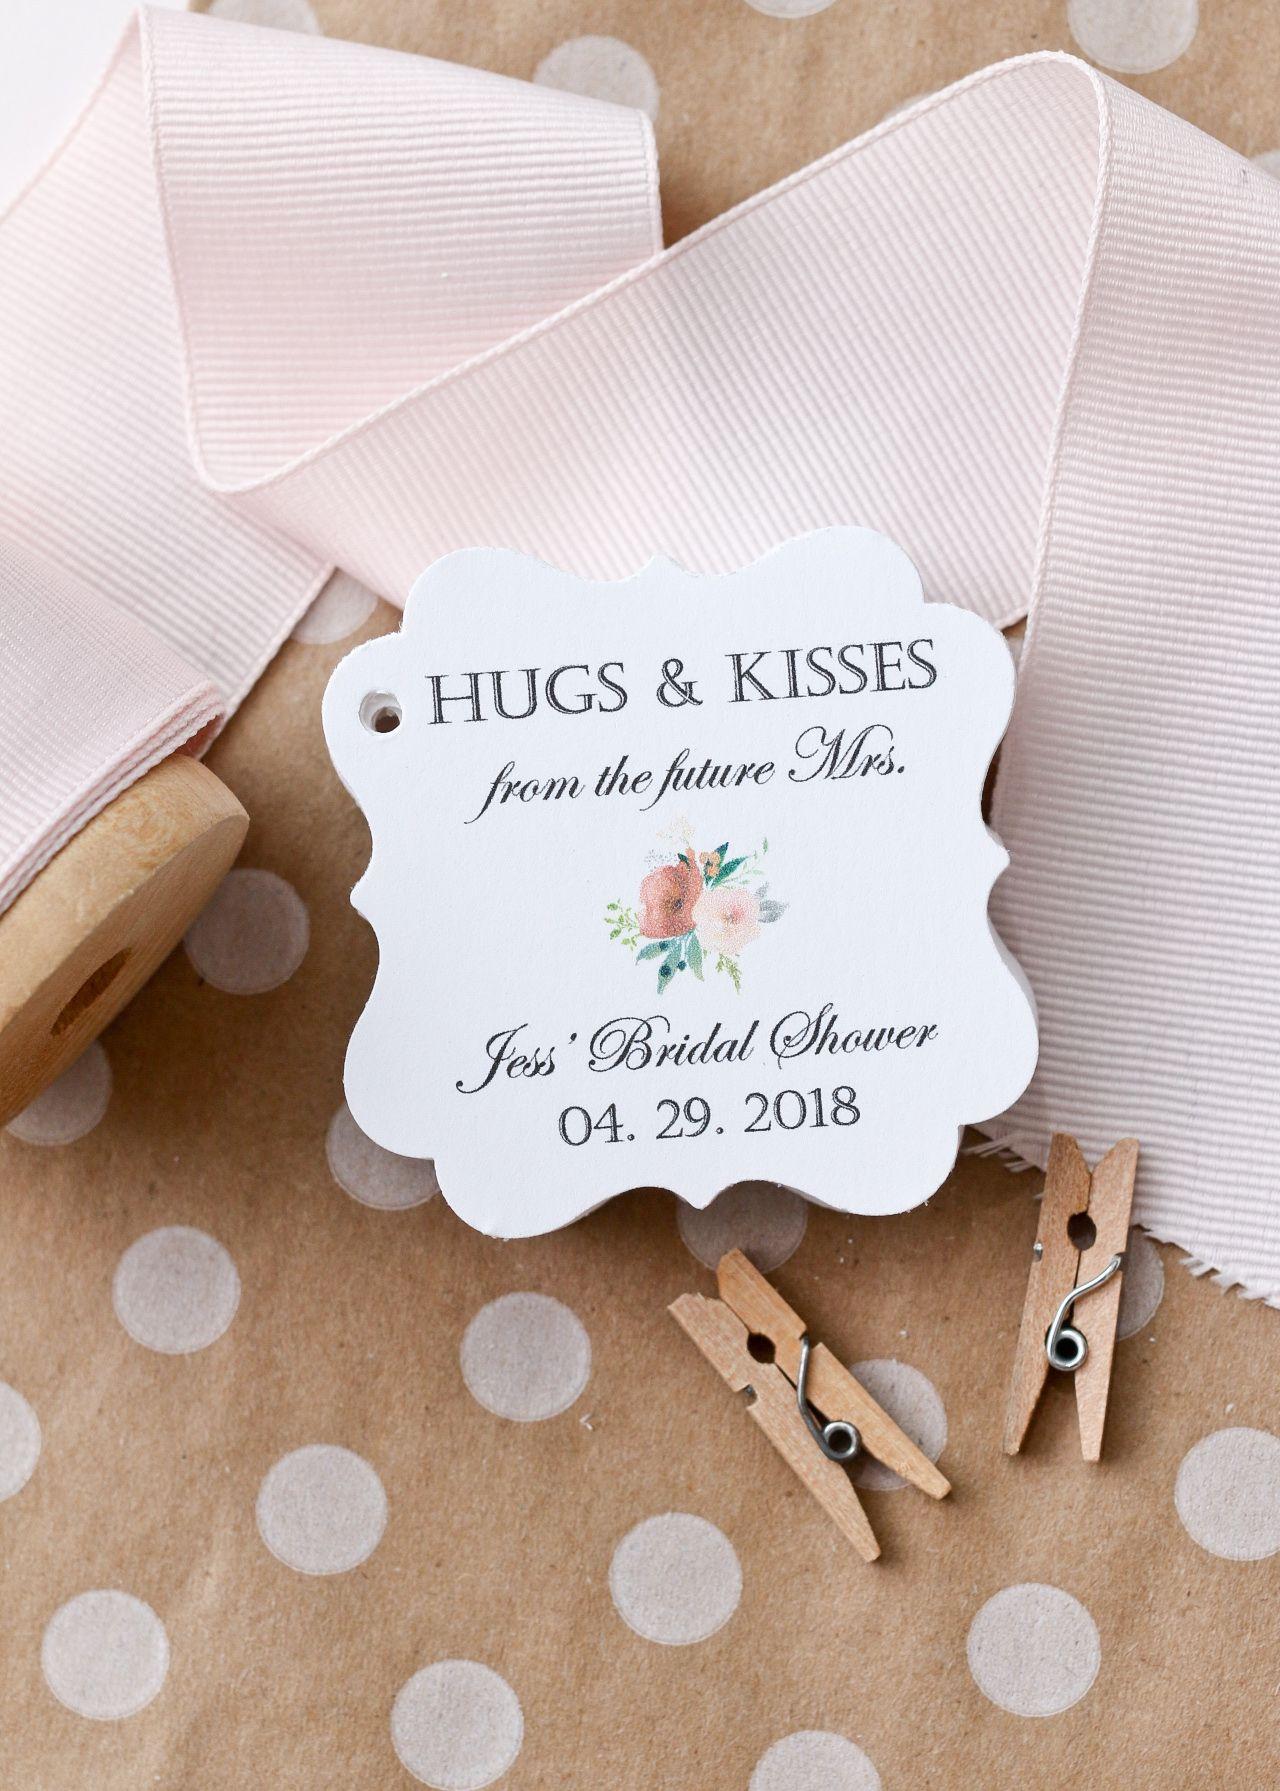 Future Mrs Favor Tags - Hugs & Kisses - Bridal Shower Favors ...